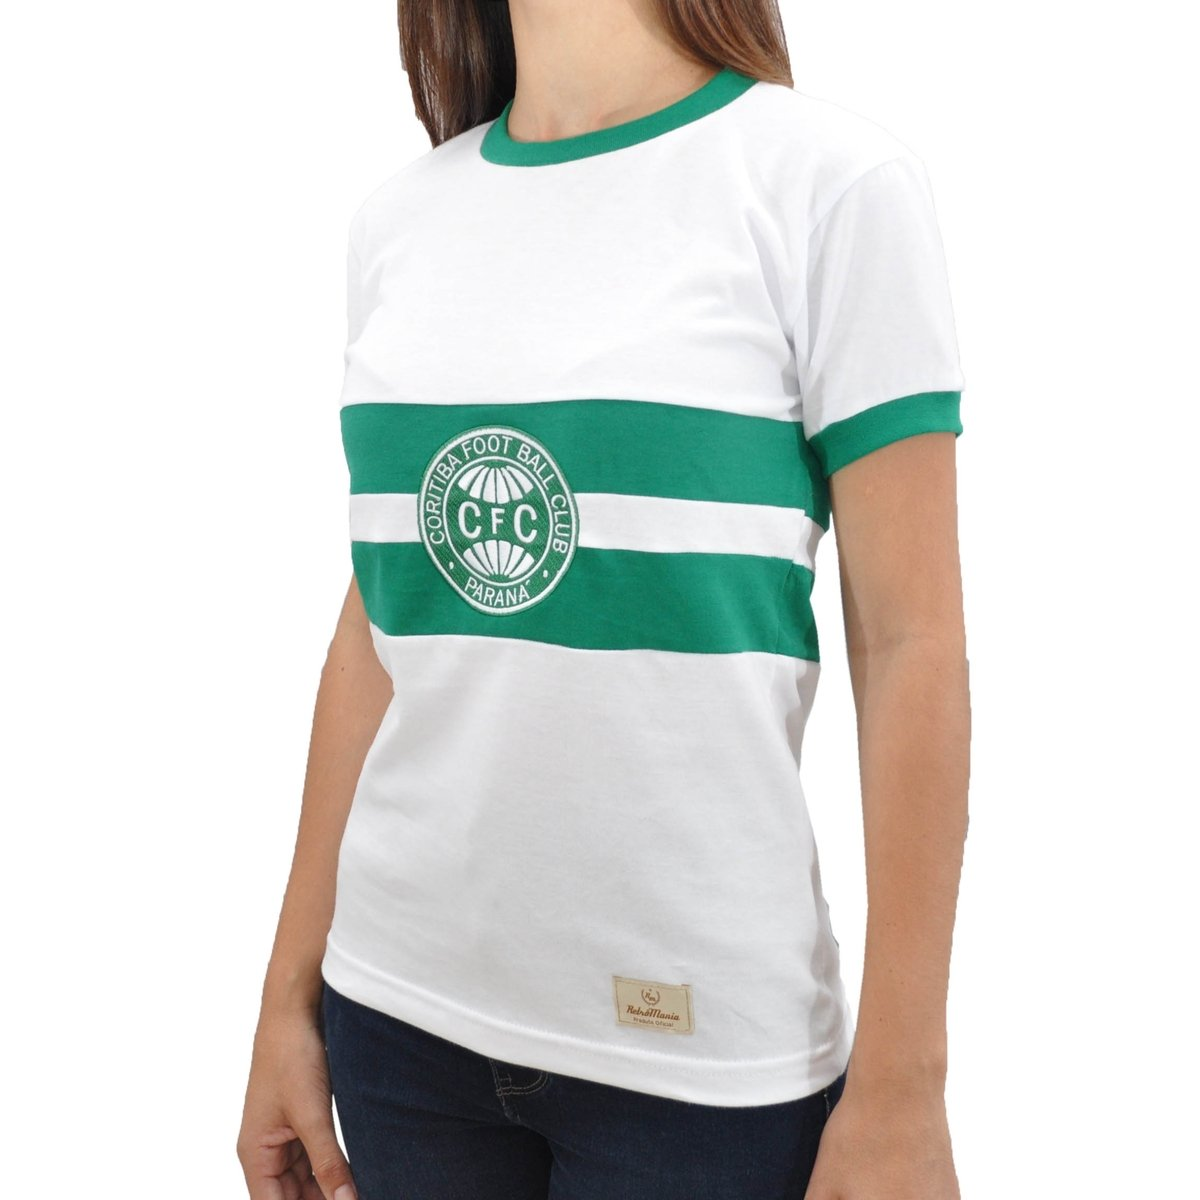 Camisa Feminina Coritiba 1976 Mania Camisa Branco Retrô Retrô Xna5xR